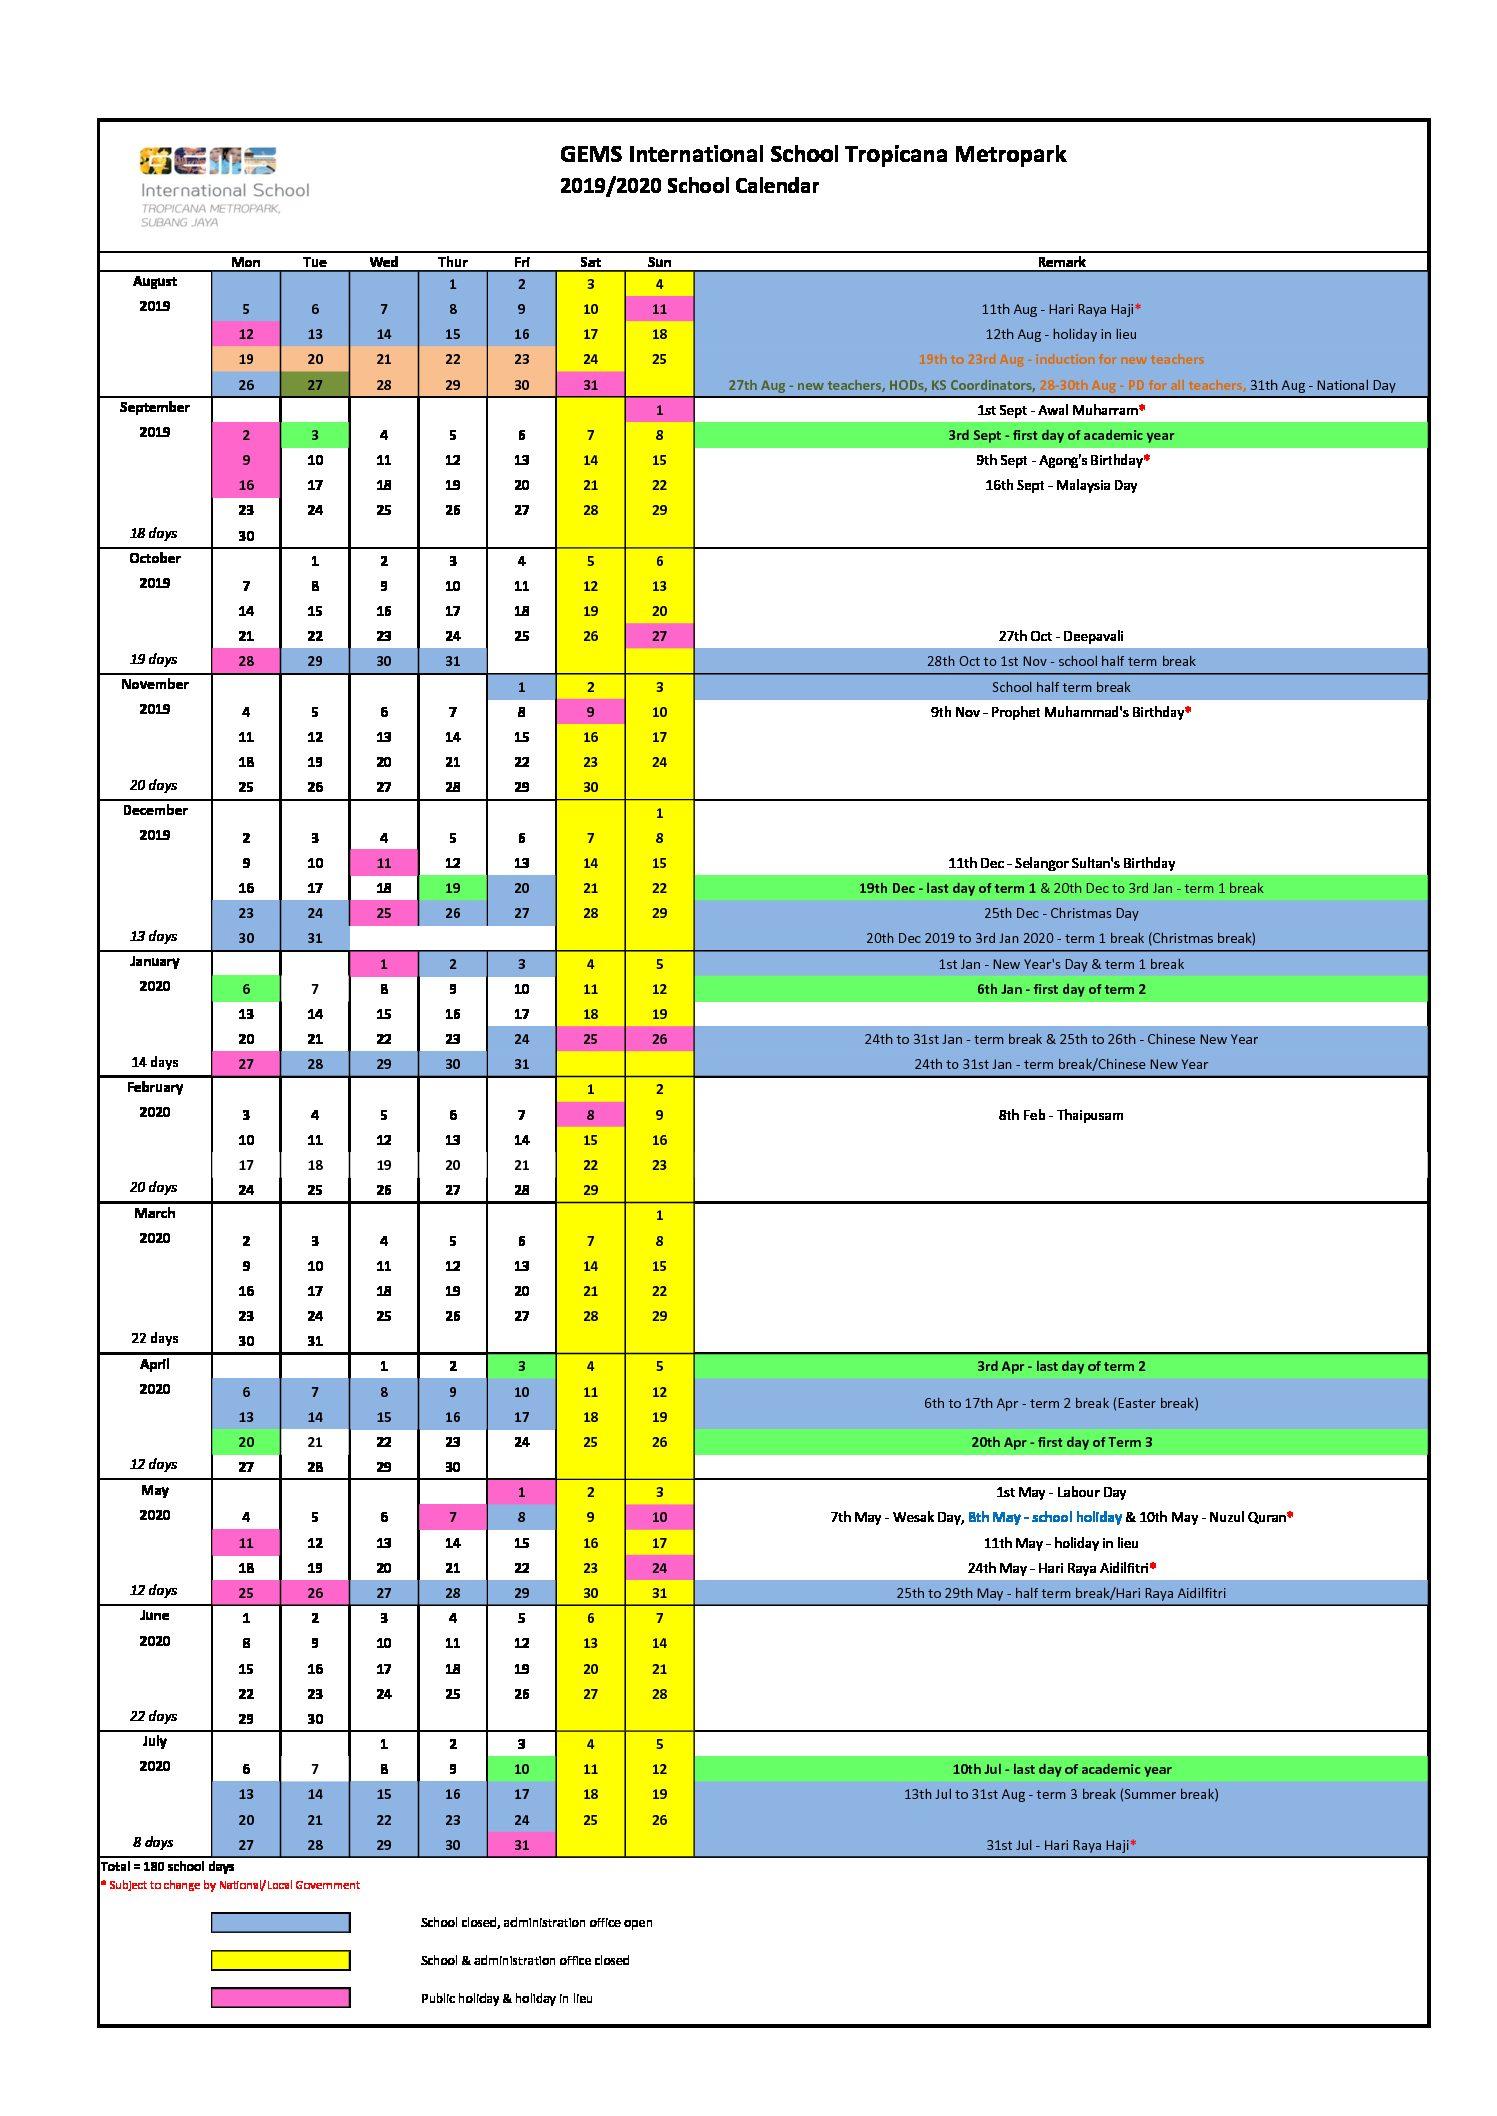 20192020 School Calendar  Gems International School Metropark inside 2020 And 2020 Pei School Calendar